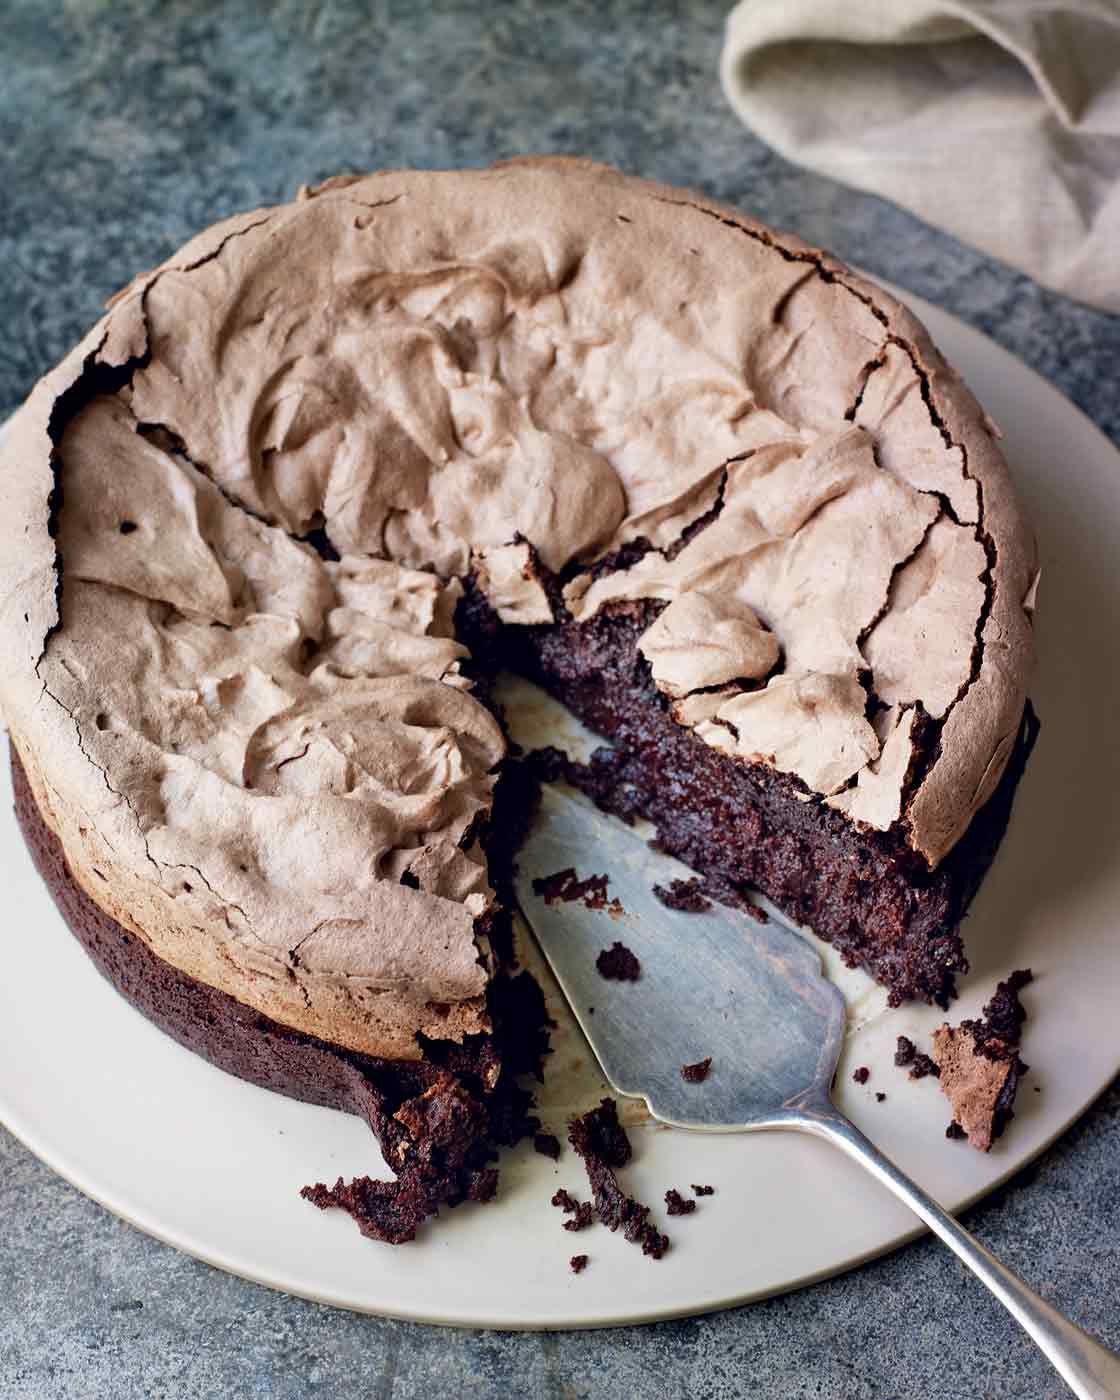 Double,baked chocolate meringue brownie